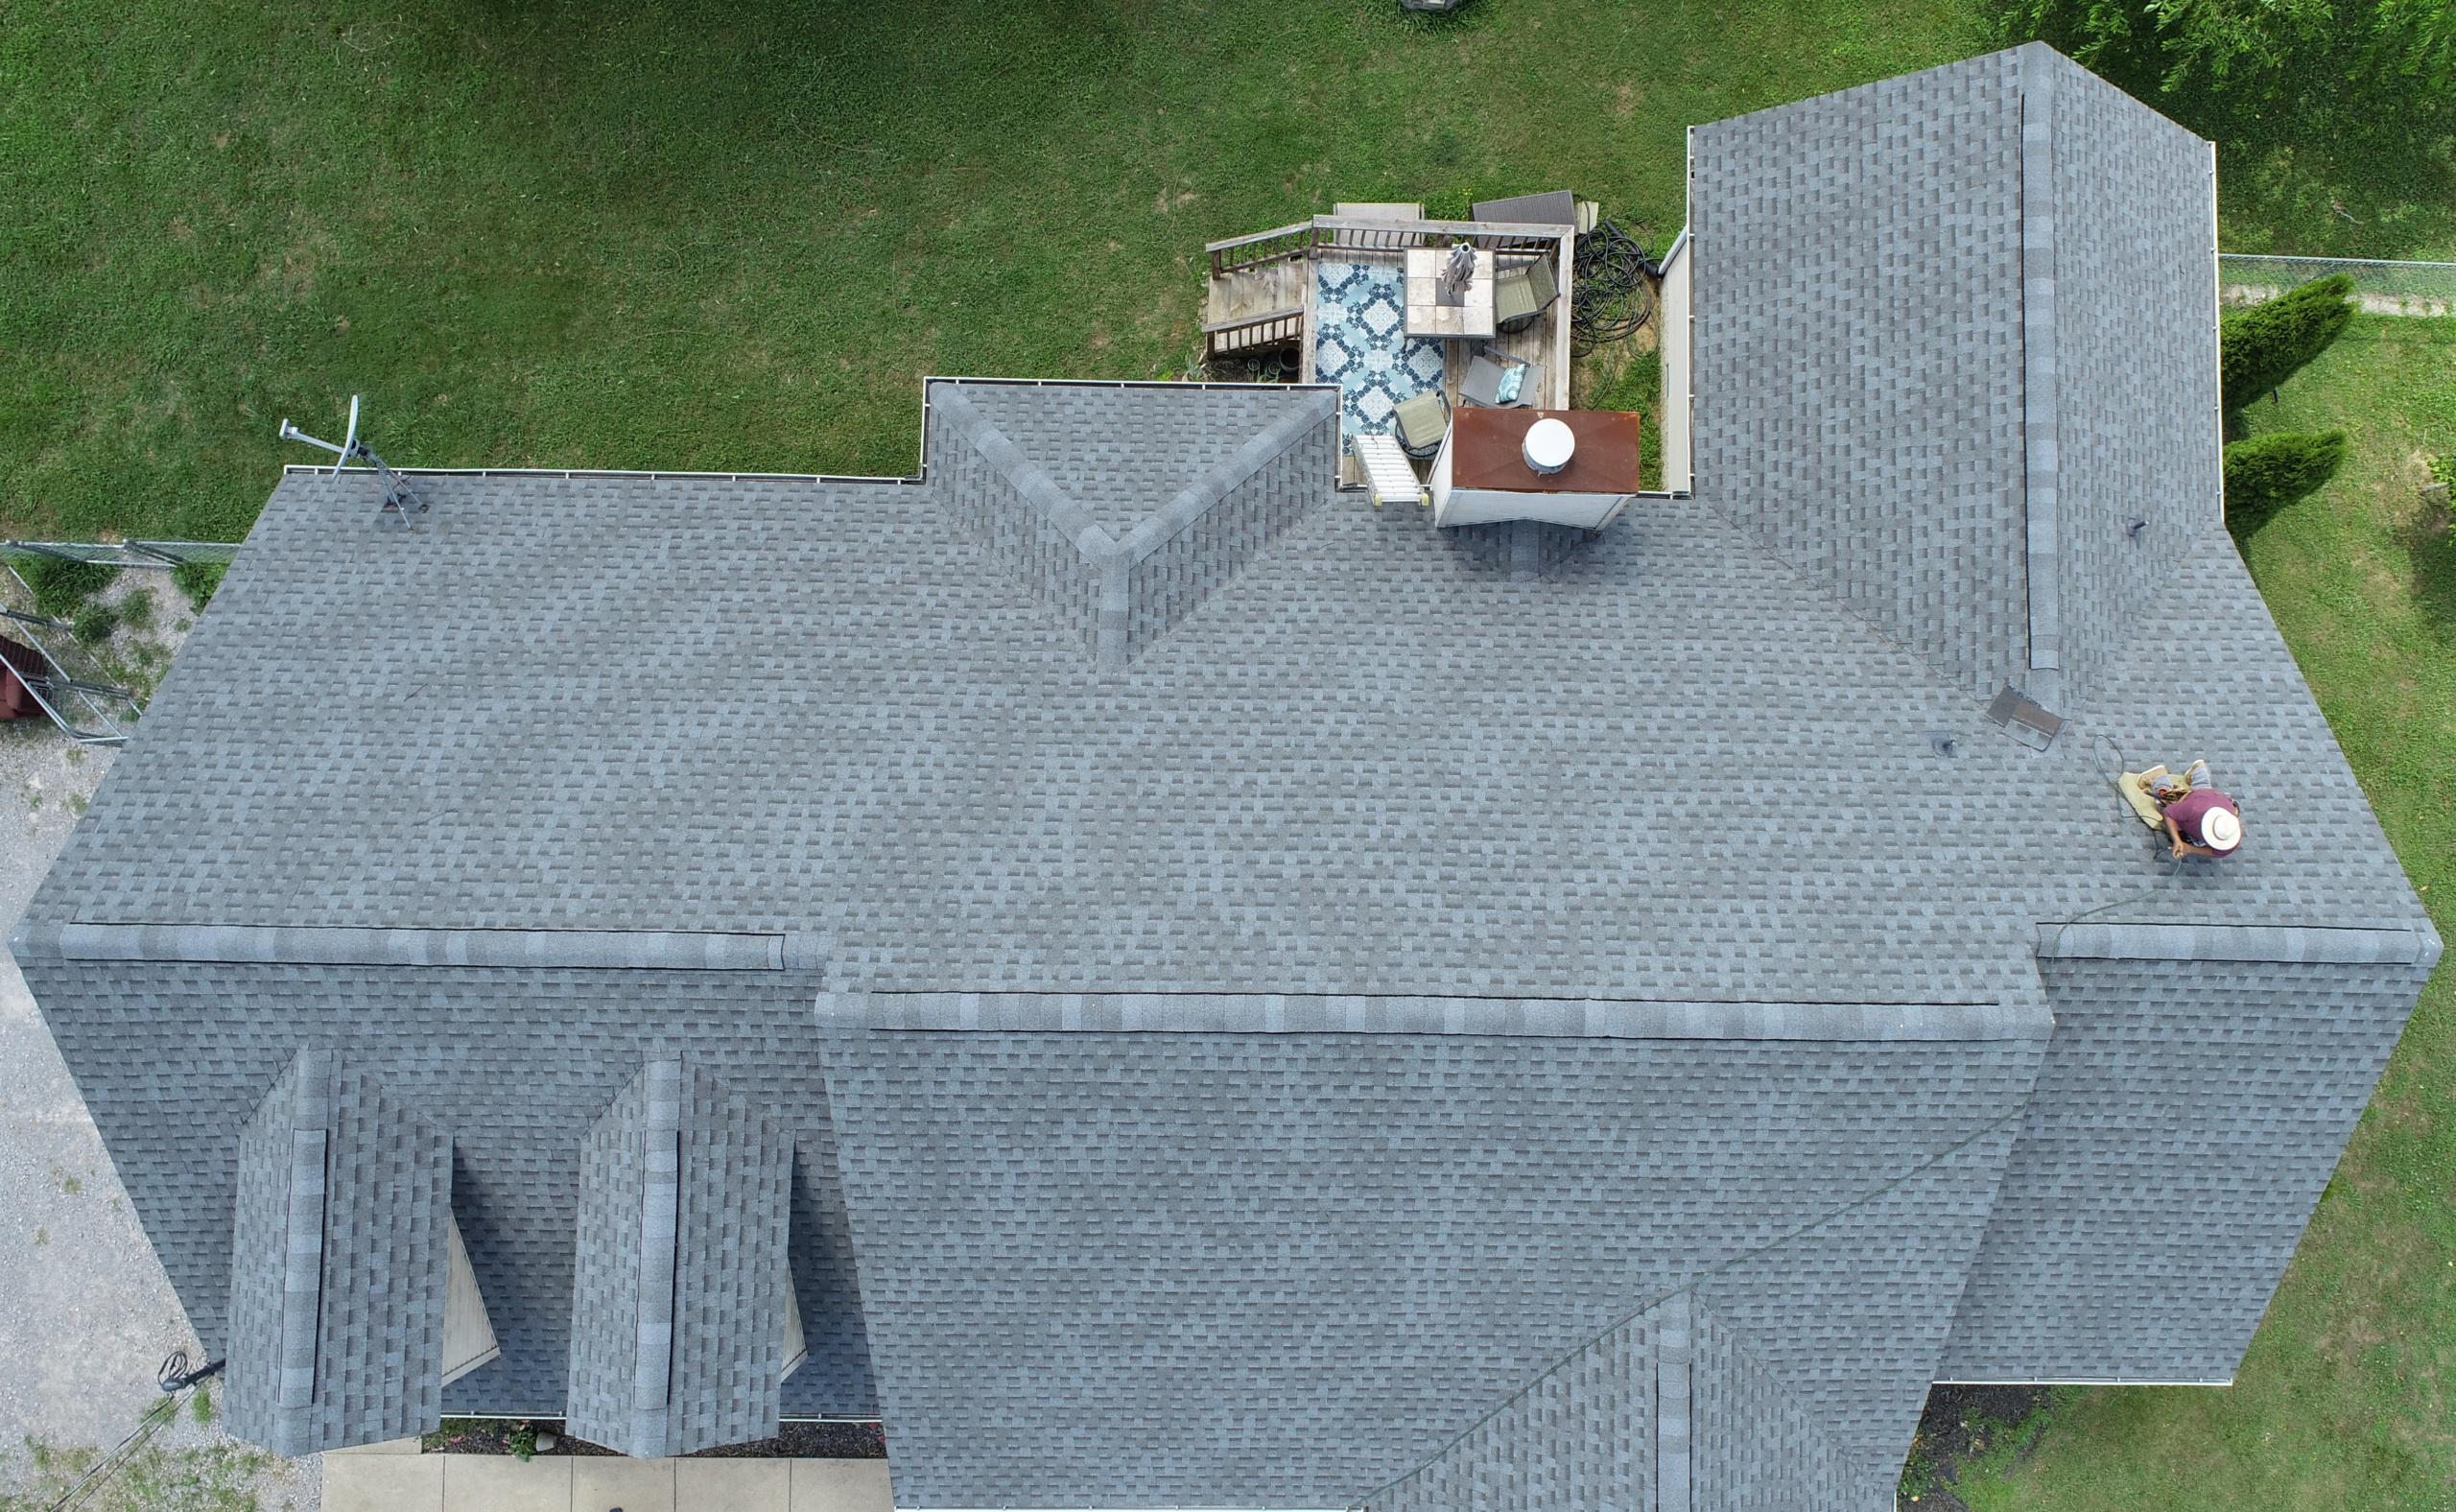 Roofing Murfreesboro GAF Pewter Gray Shingles 6